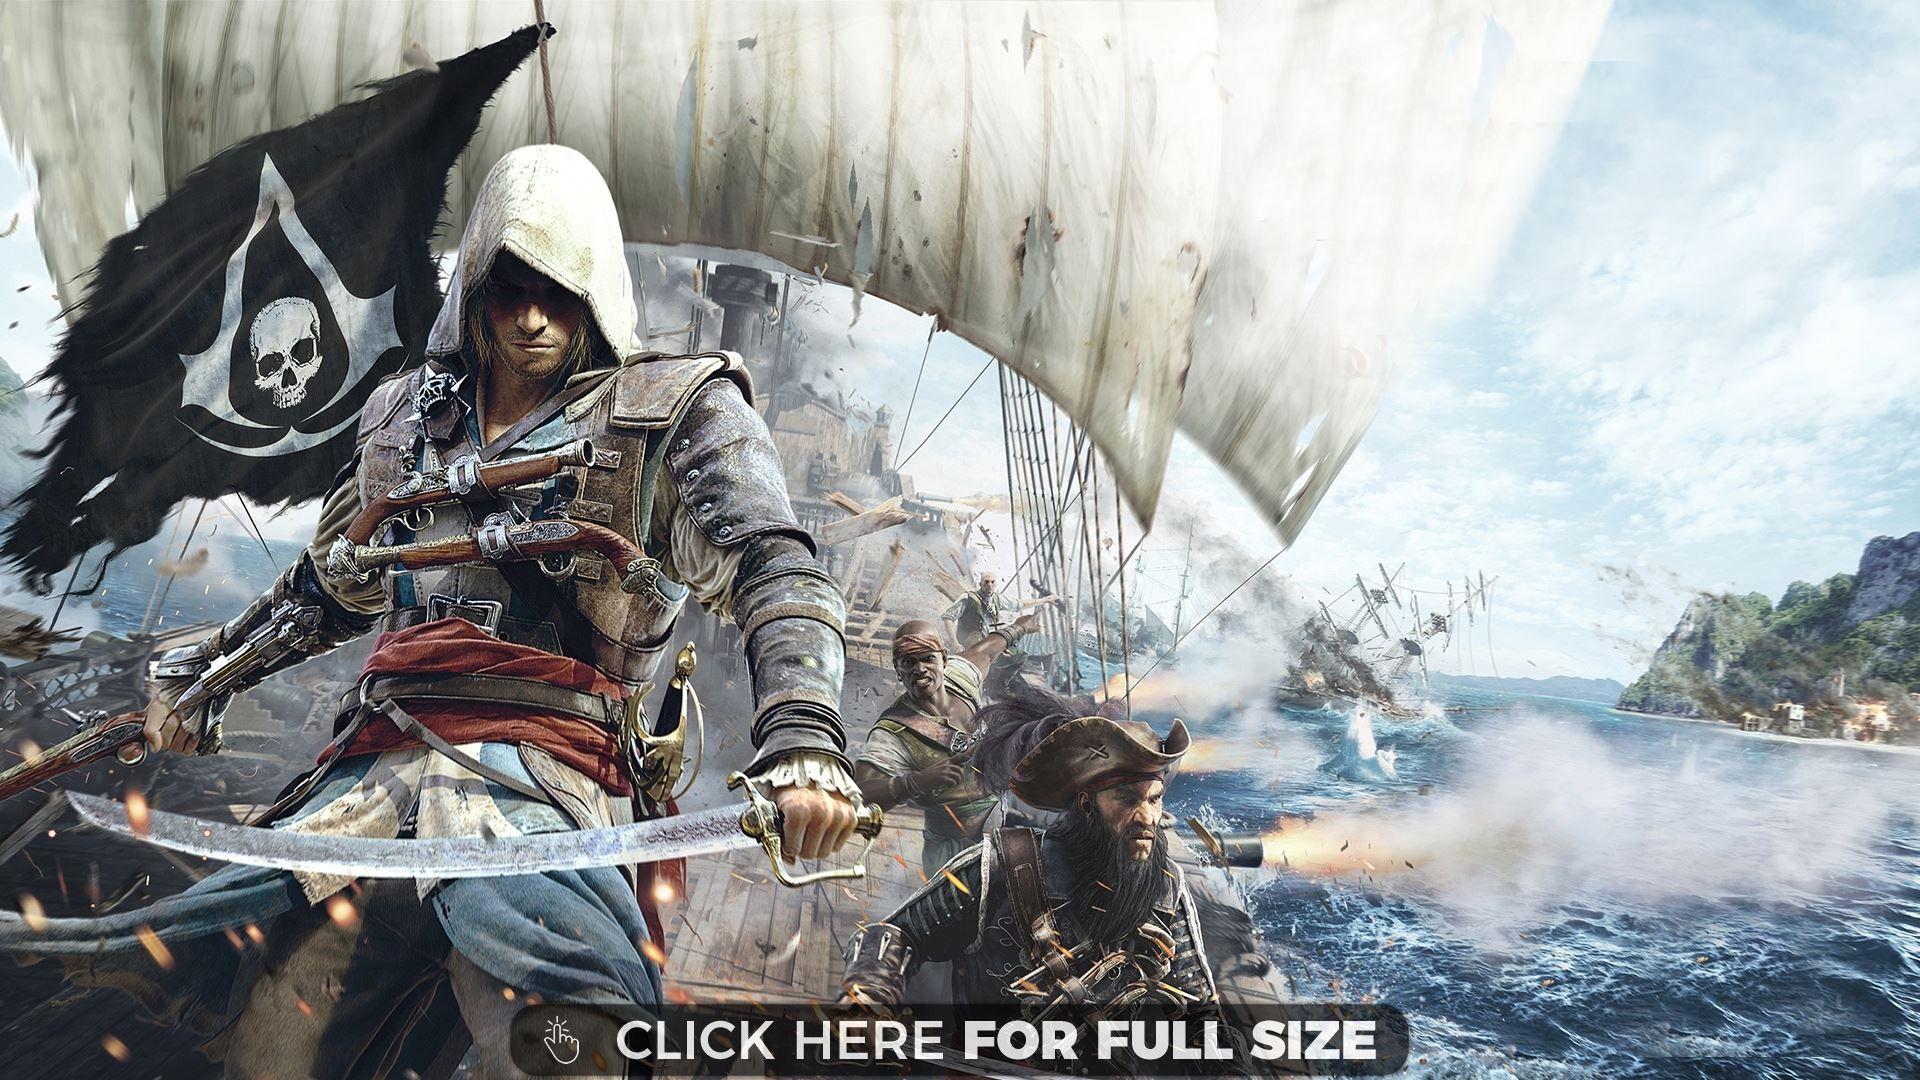 Assassin S Creed 4k Wallpaper Pack - Wallpaper